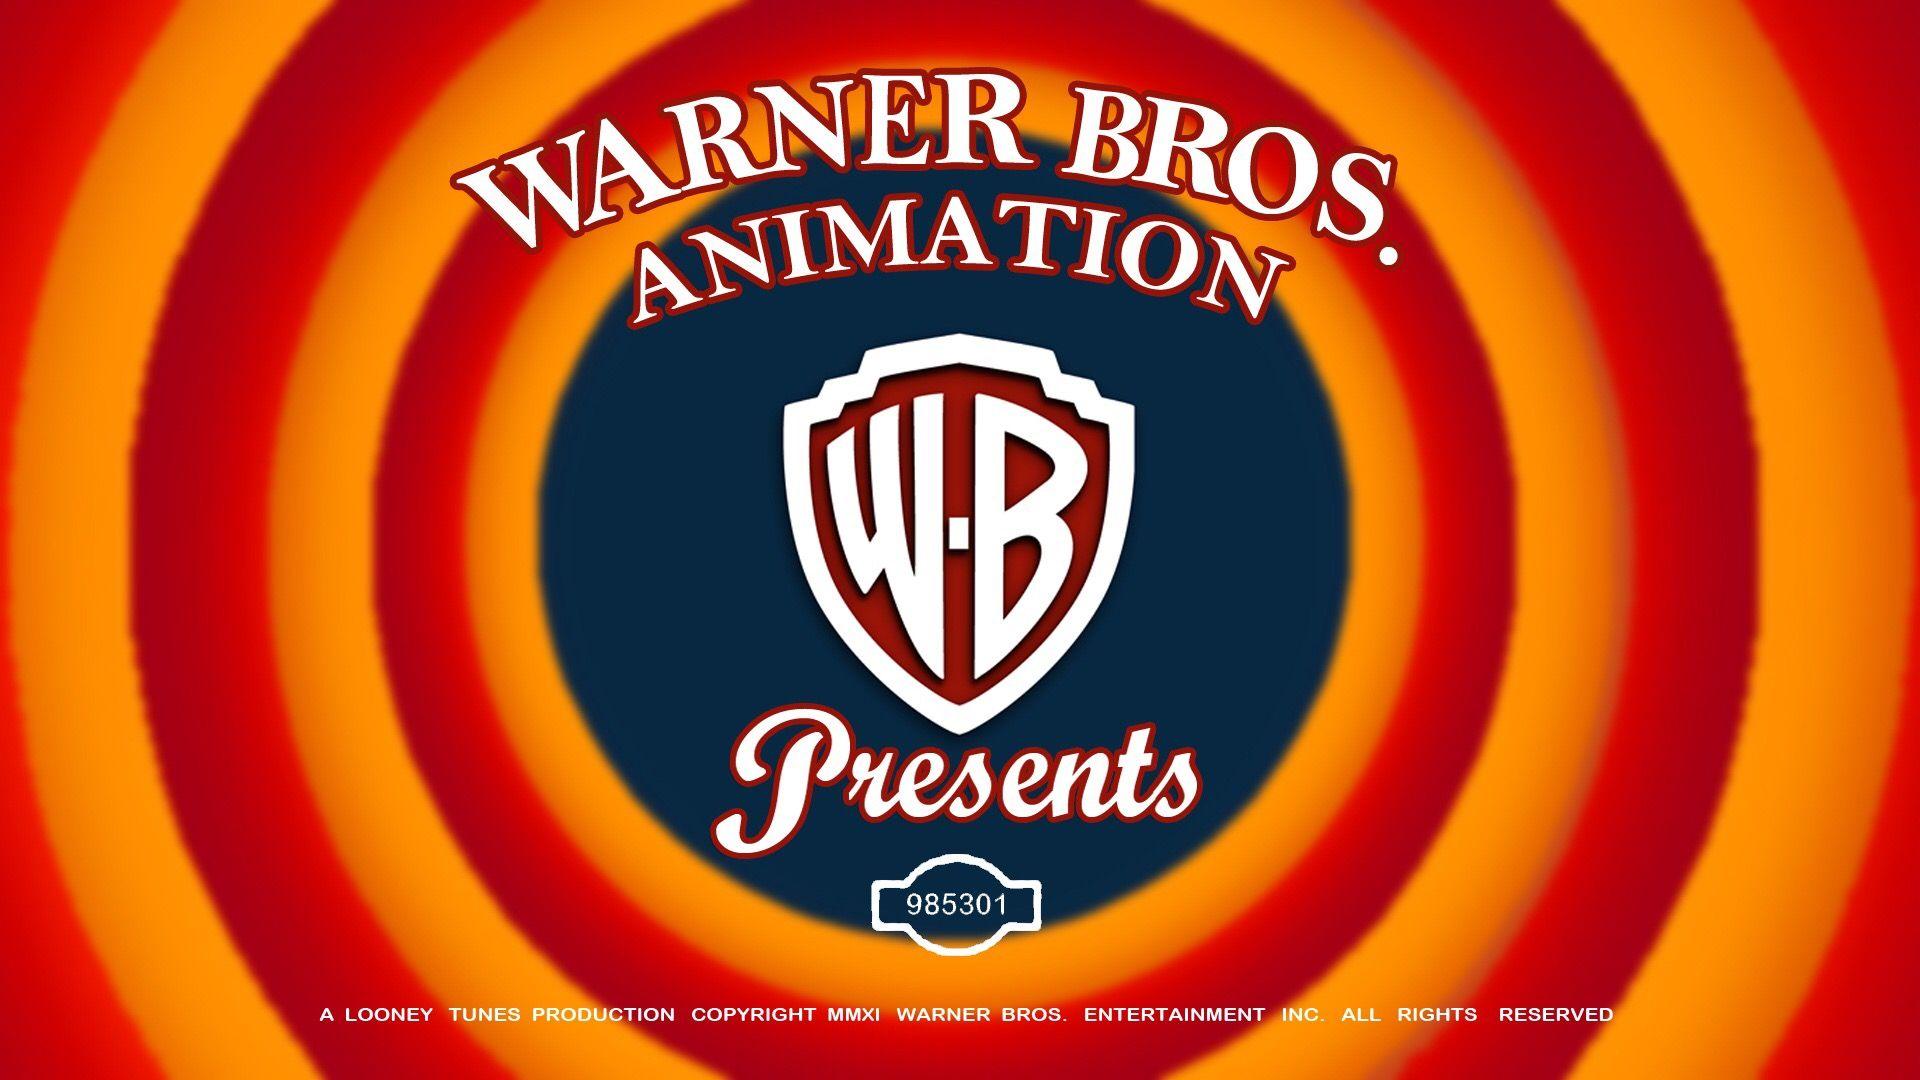 Warner Bros animation movies logo  | Warner Bros  in 2019